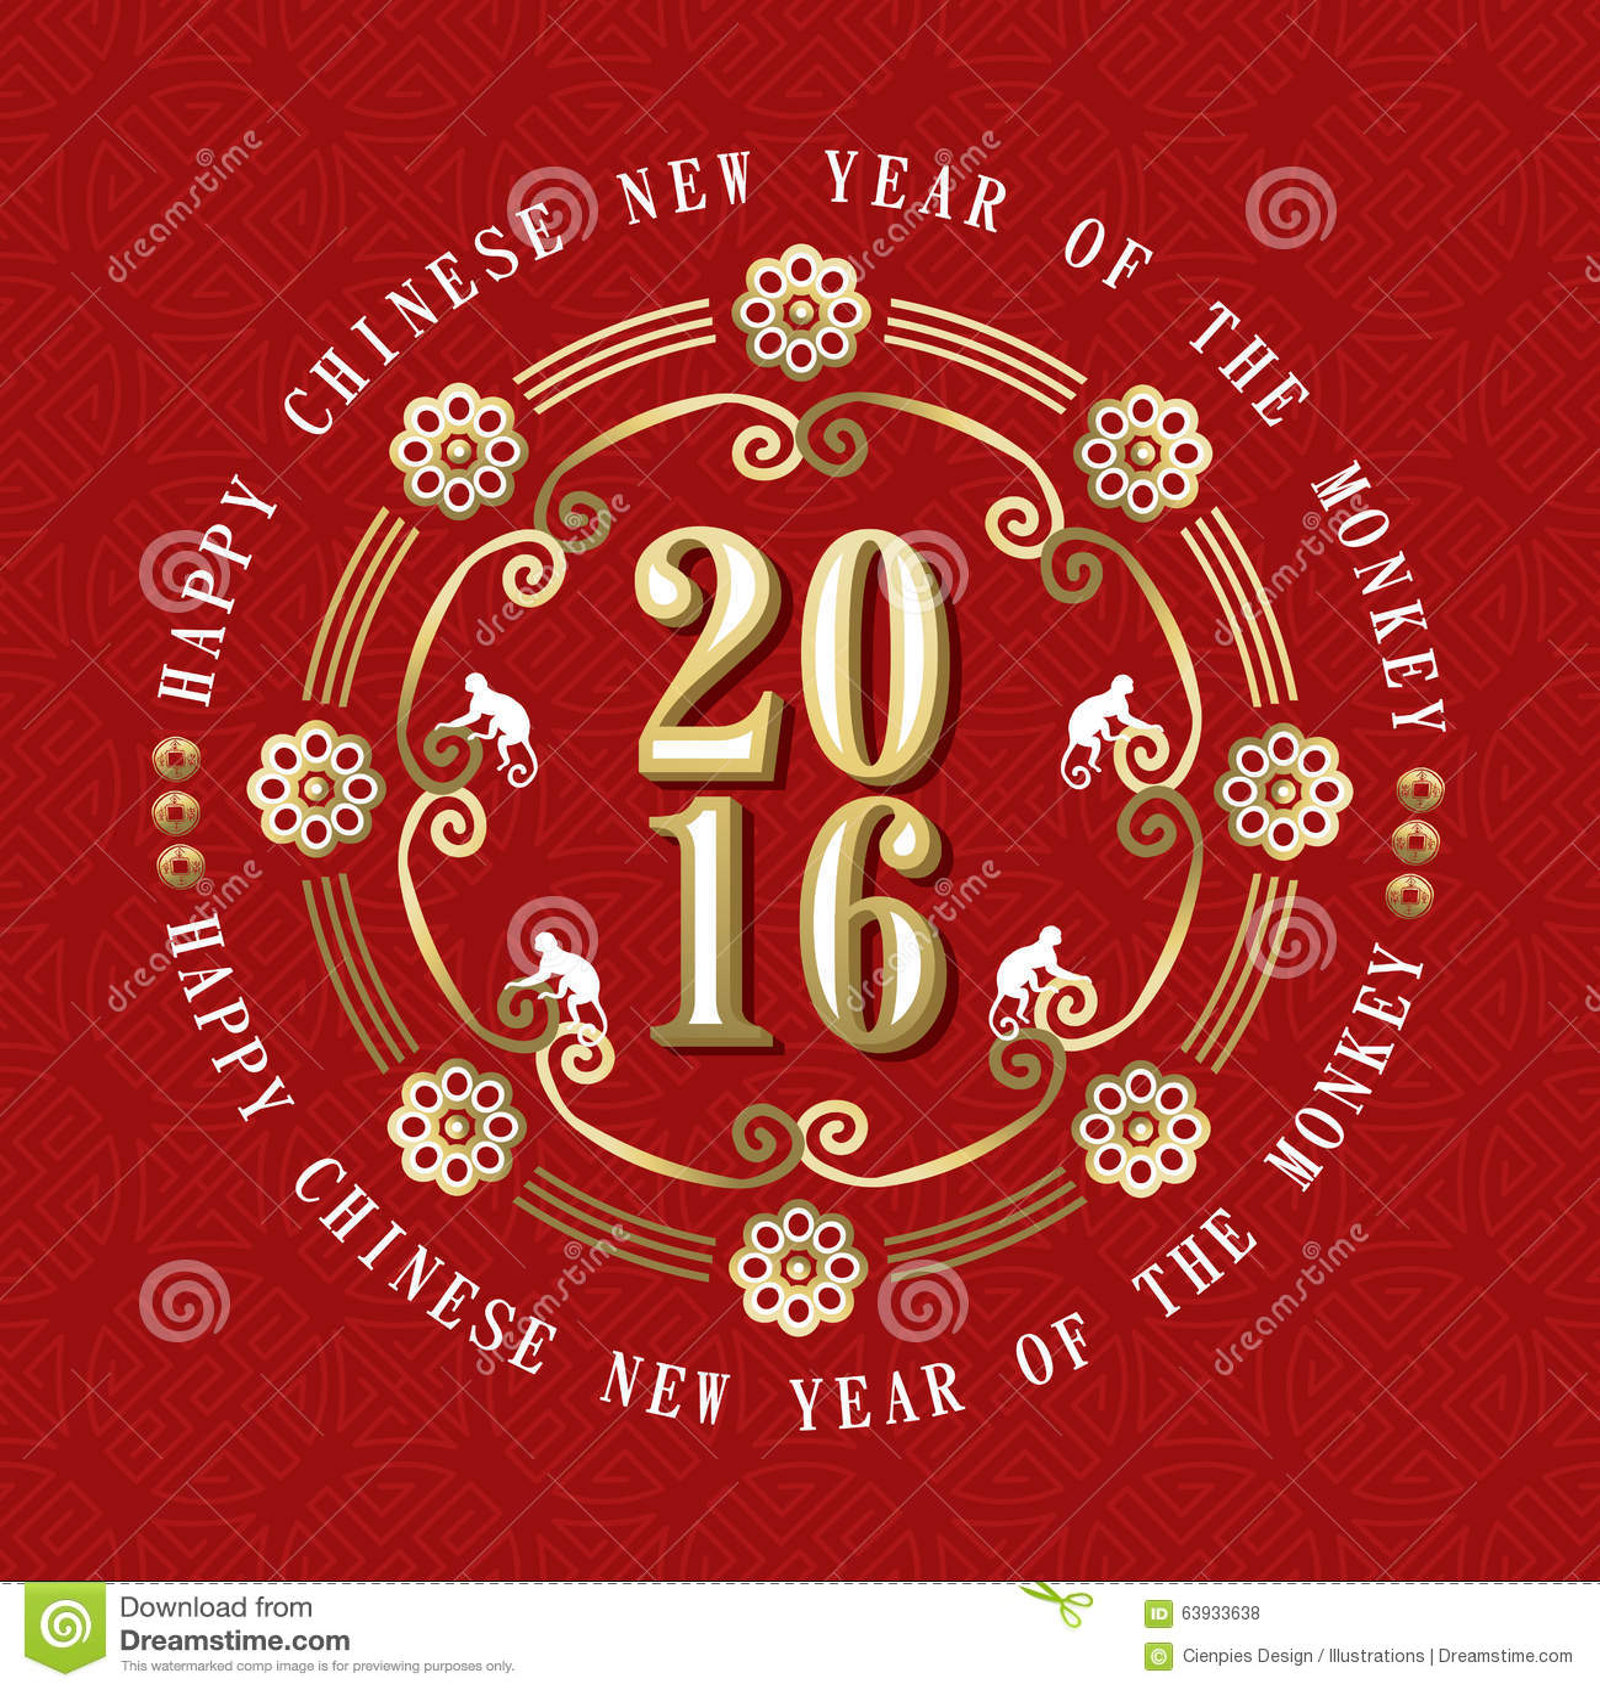 Gold Happy New Year Chinese Symbols